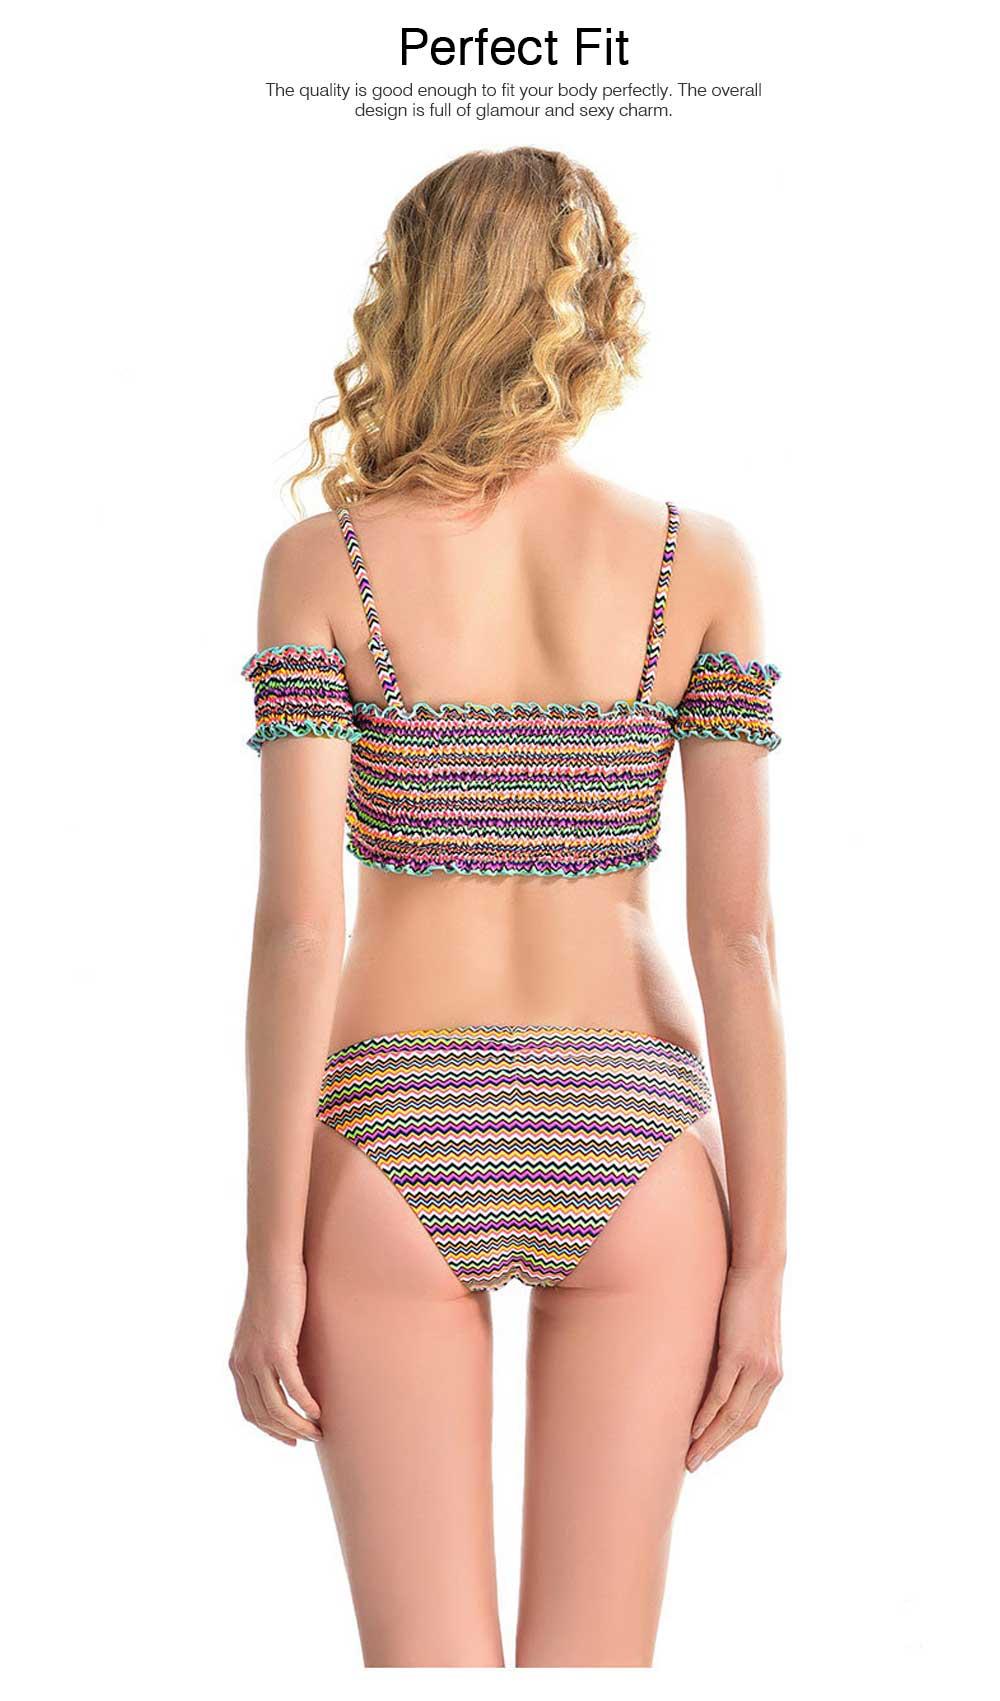 Off Shoulder with Straps Bikini for Girls, Tube Top Split Bikini, Women Sexy Swimwear 2 PCS, Women Colored Lines Popular Off Shoulder Beach Suit 5